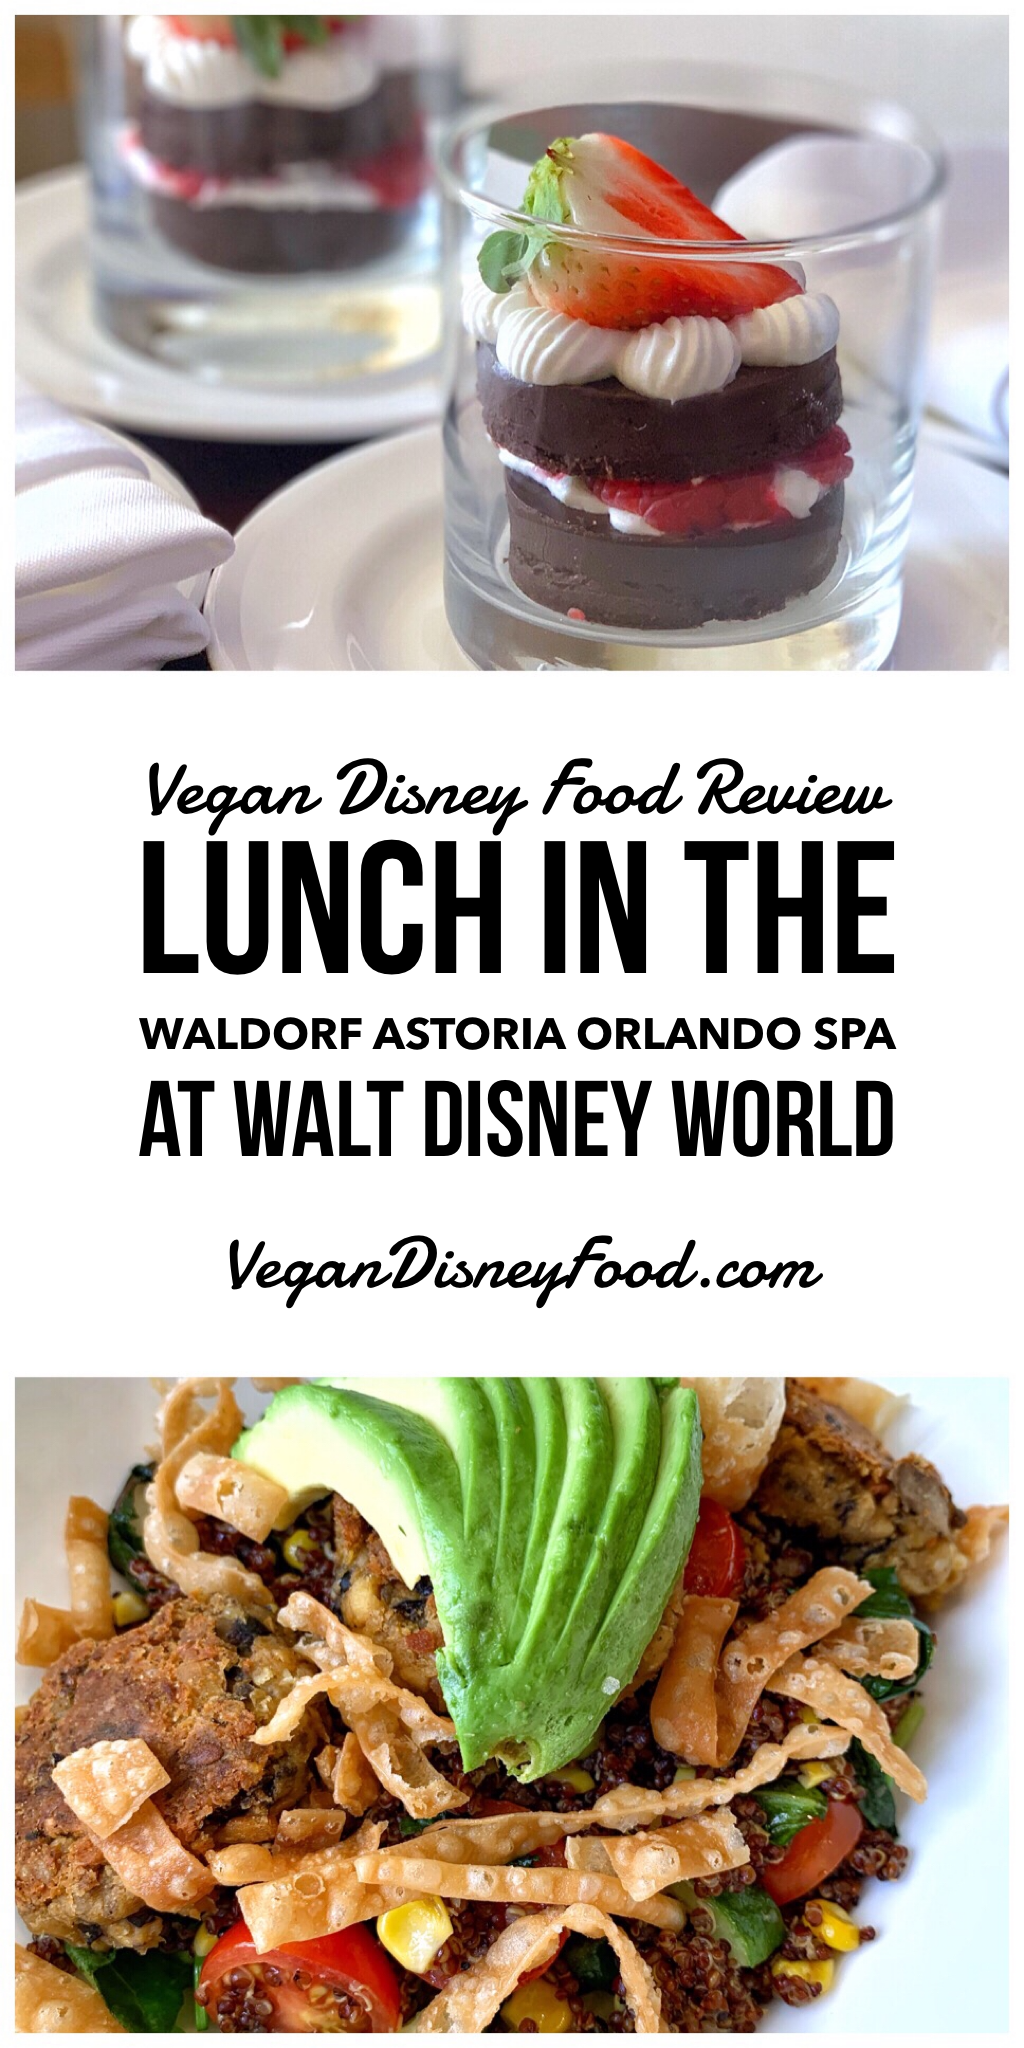 Vegan Disney Food Review: Lunch in the Waldorf Astoria Orlando Spa at Walt Disney World